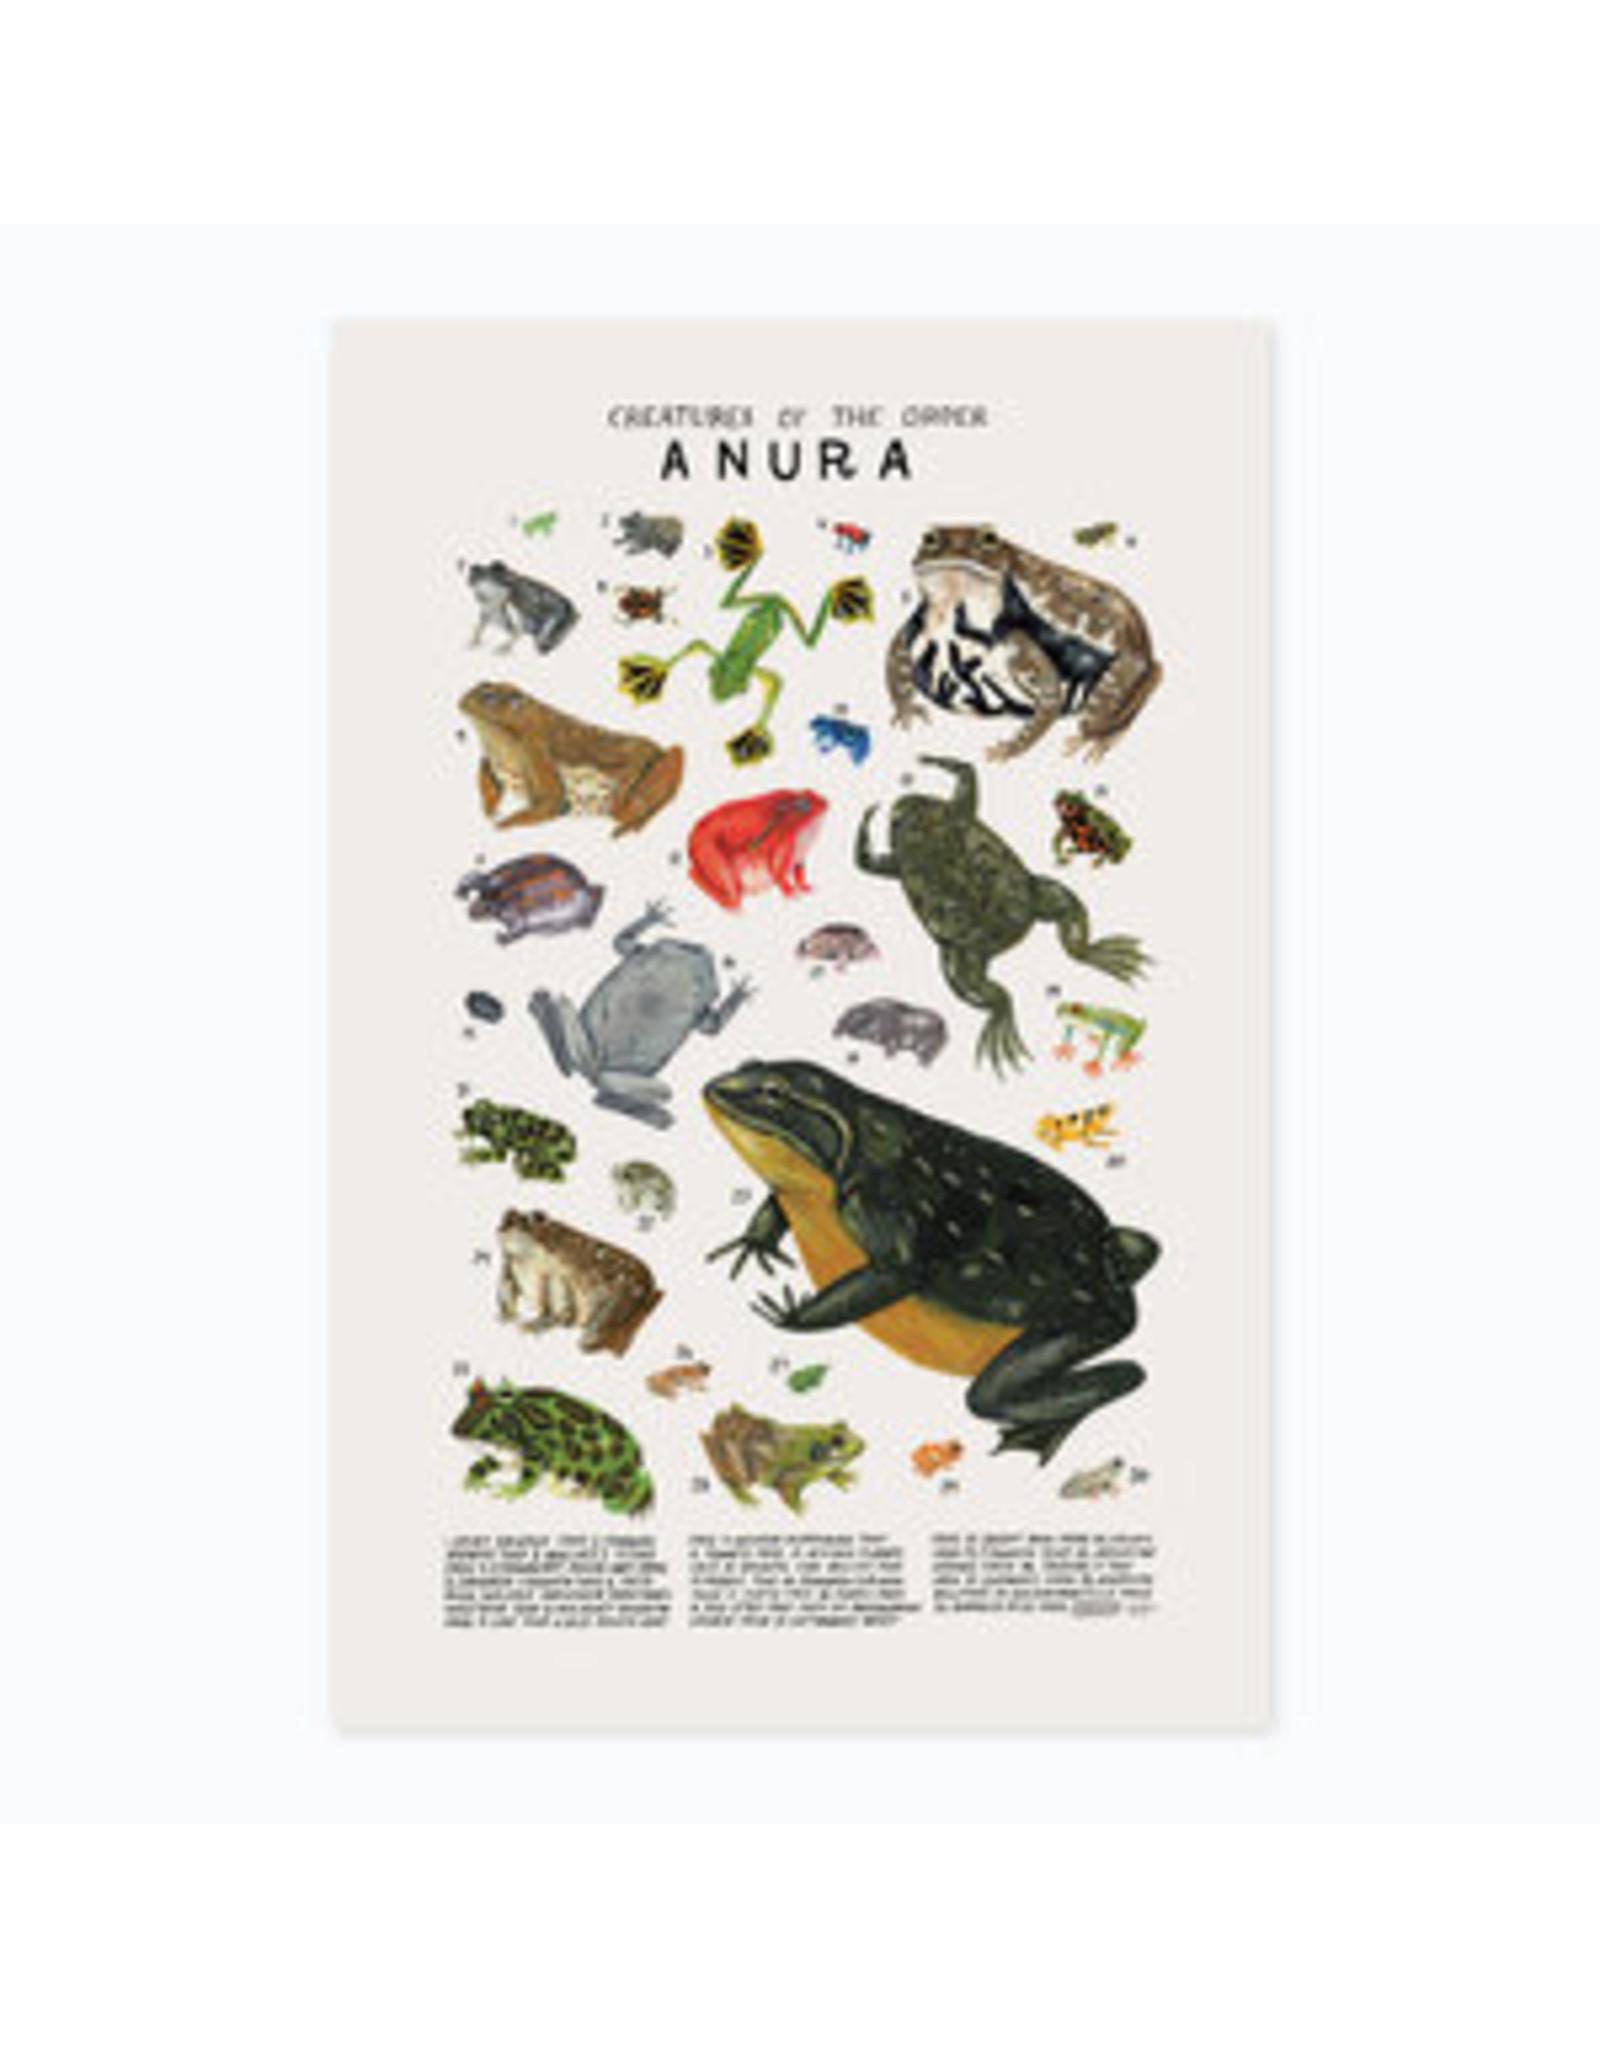 Kelzuki/Consignment Mini Print Consignment - Anura